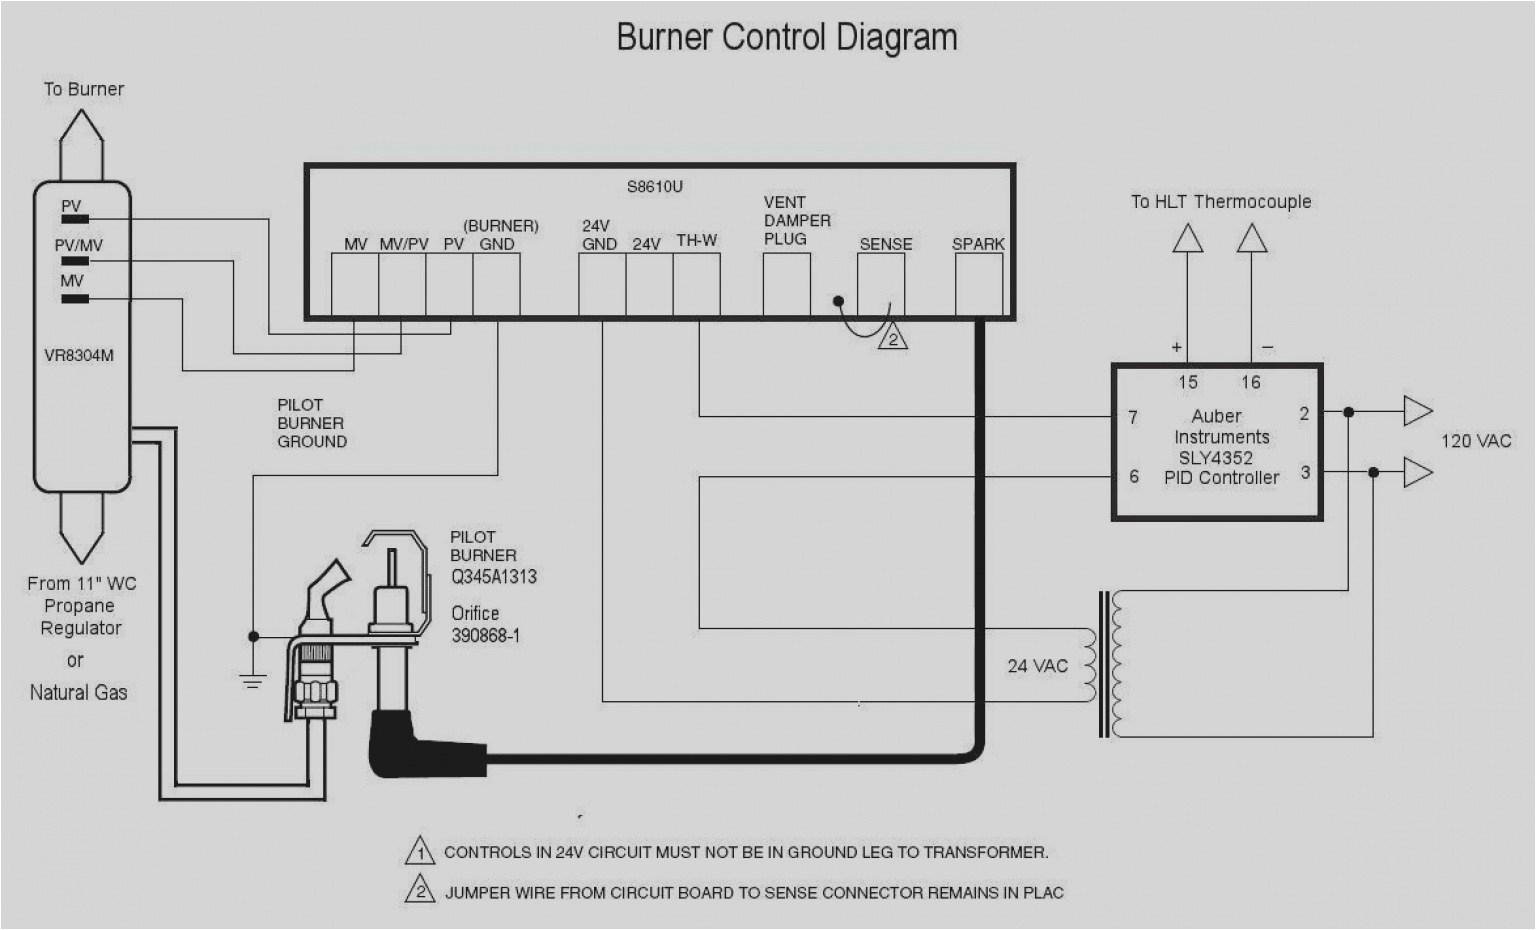 honeywell ra89a wiring schematic wiring diagram bloghoneywell wiring schematic wiring diagram blog honeywell ra89a wiring schematic